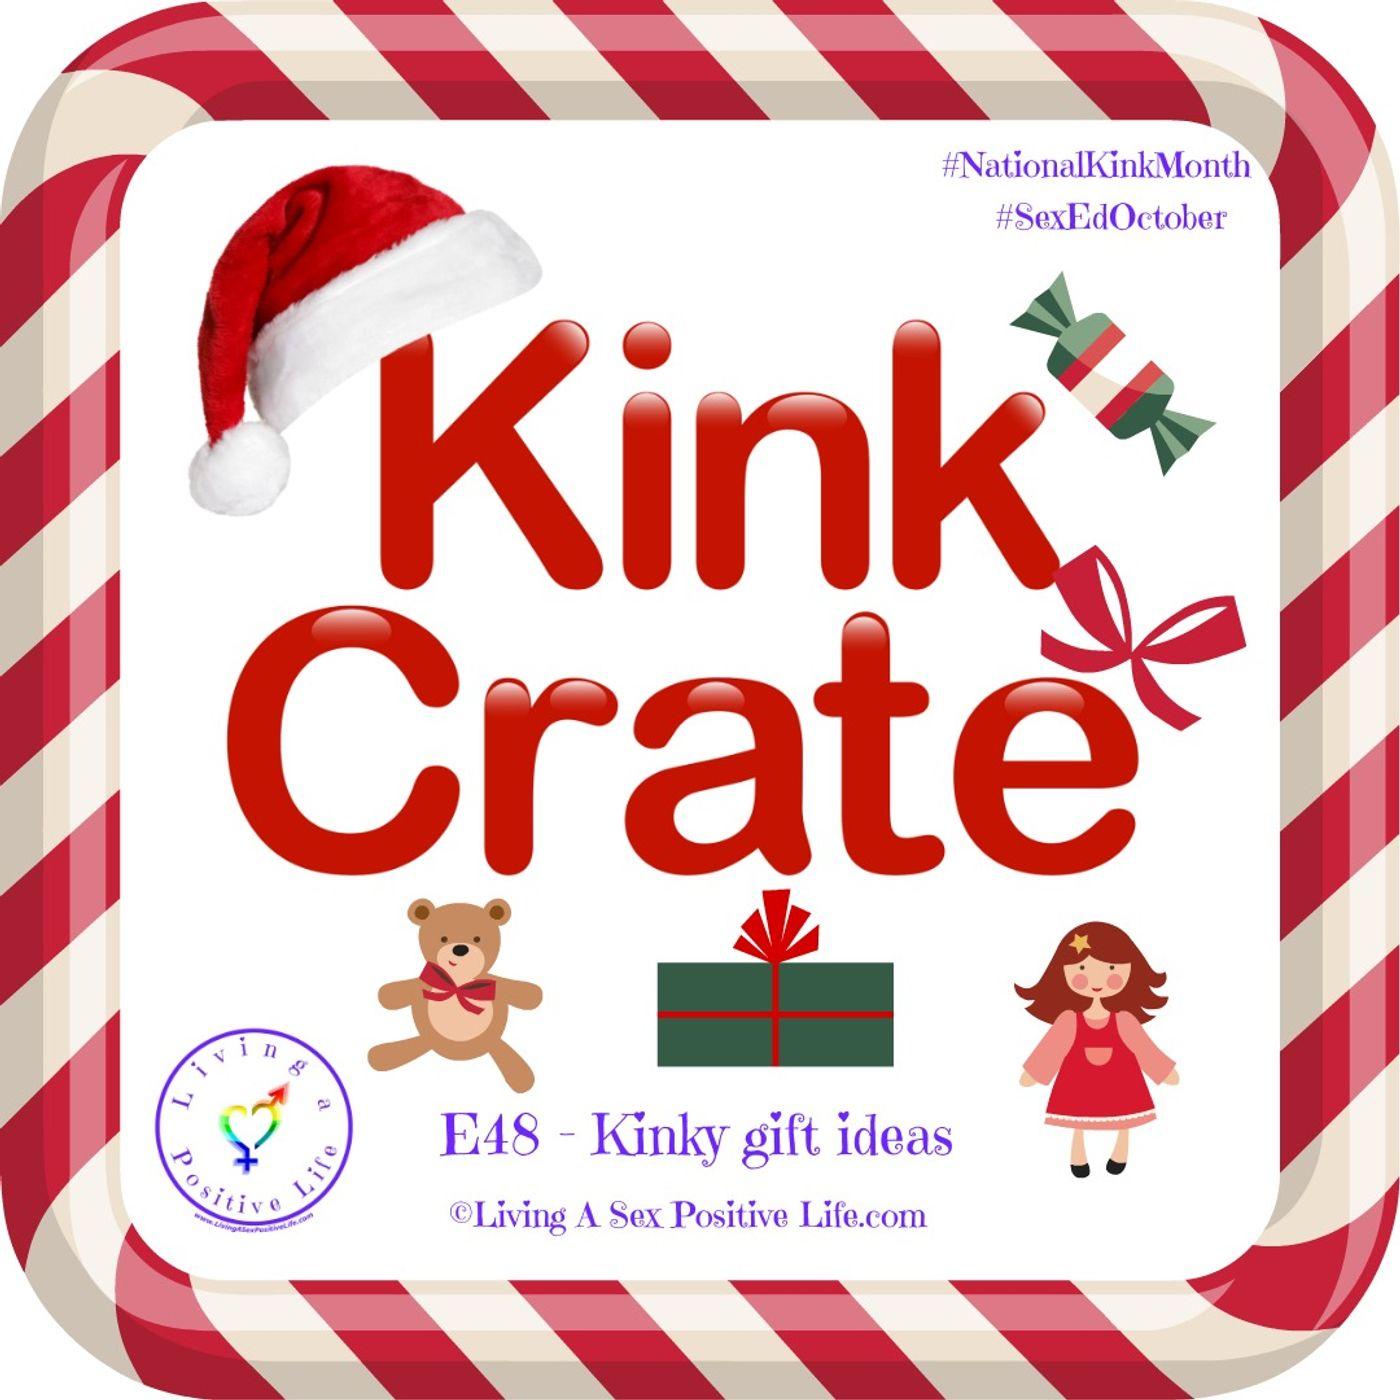 Sex Positive Me - E48 - Kinky Gift Ideas